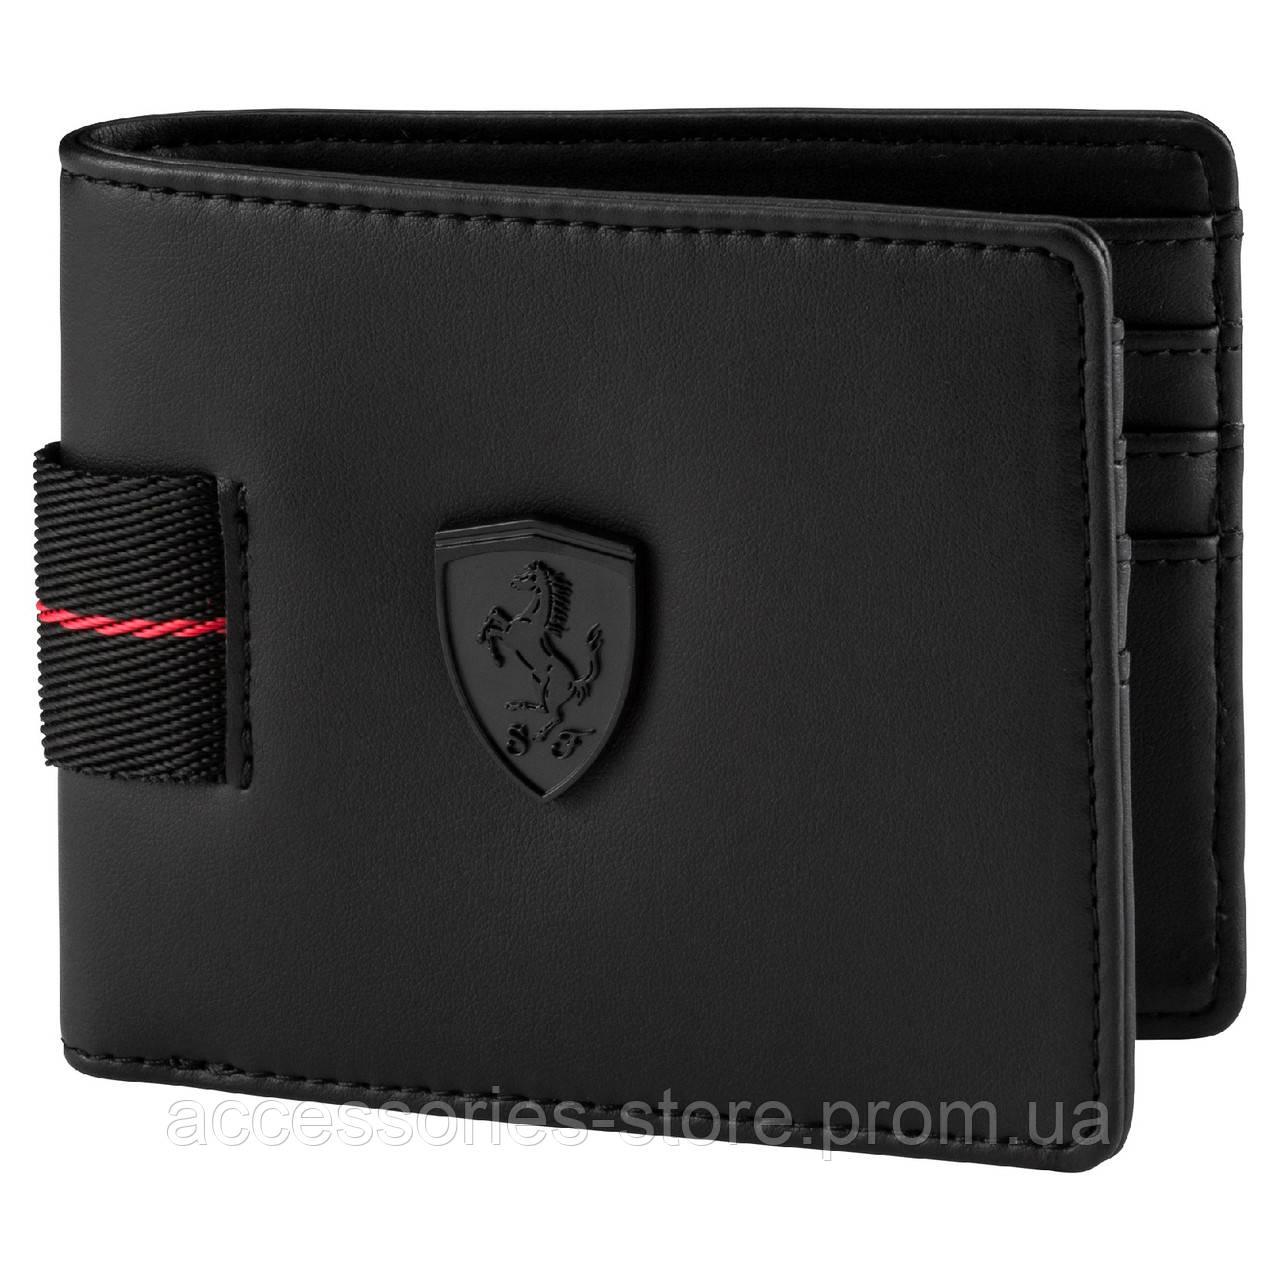 Кошелек Ferrari Brand Black Shadow Wallet, Black